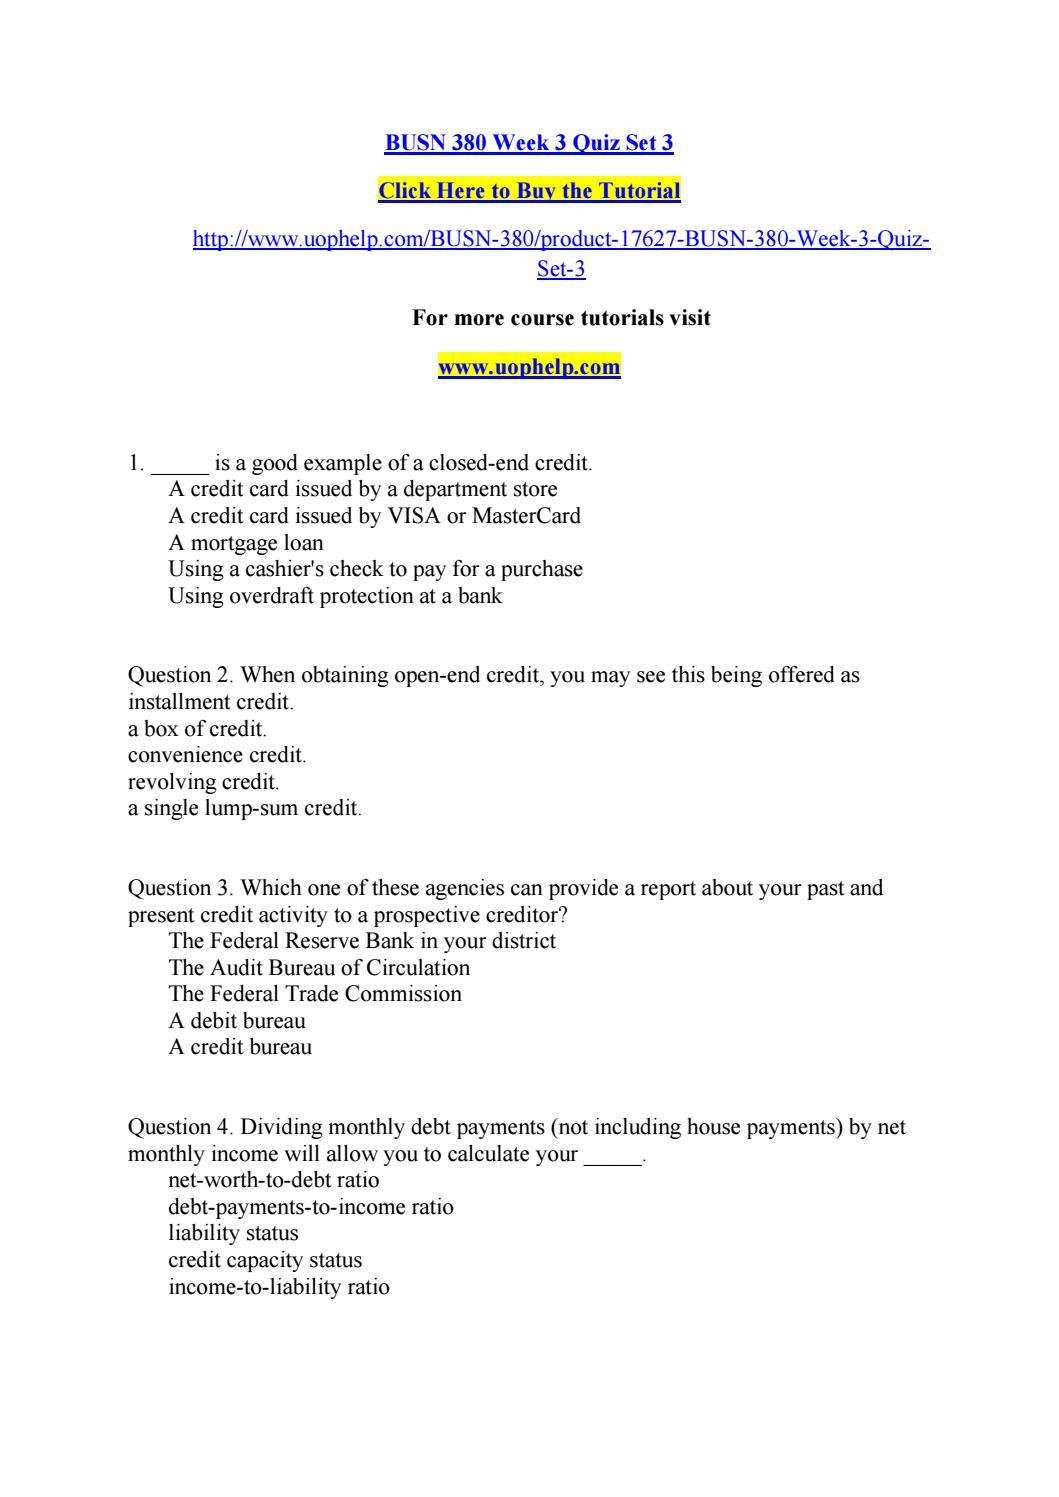 Busn 380 Week 3 Quiz Set 3 By Williammoseley9 Issuu